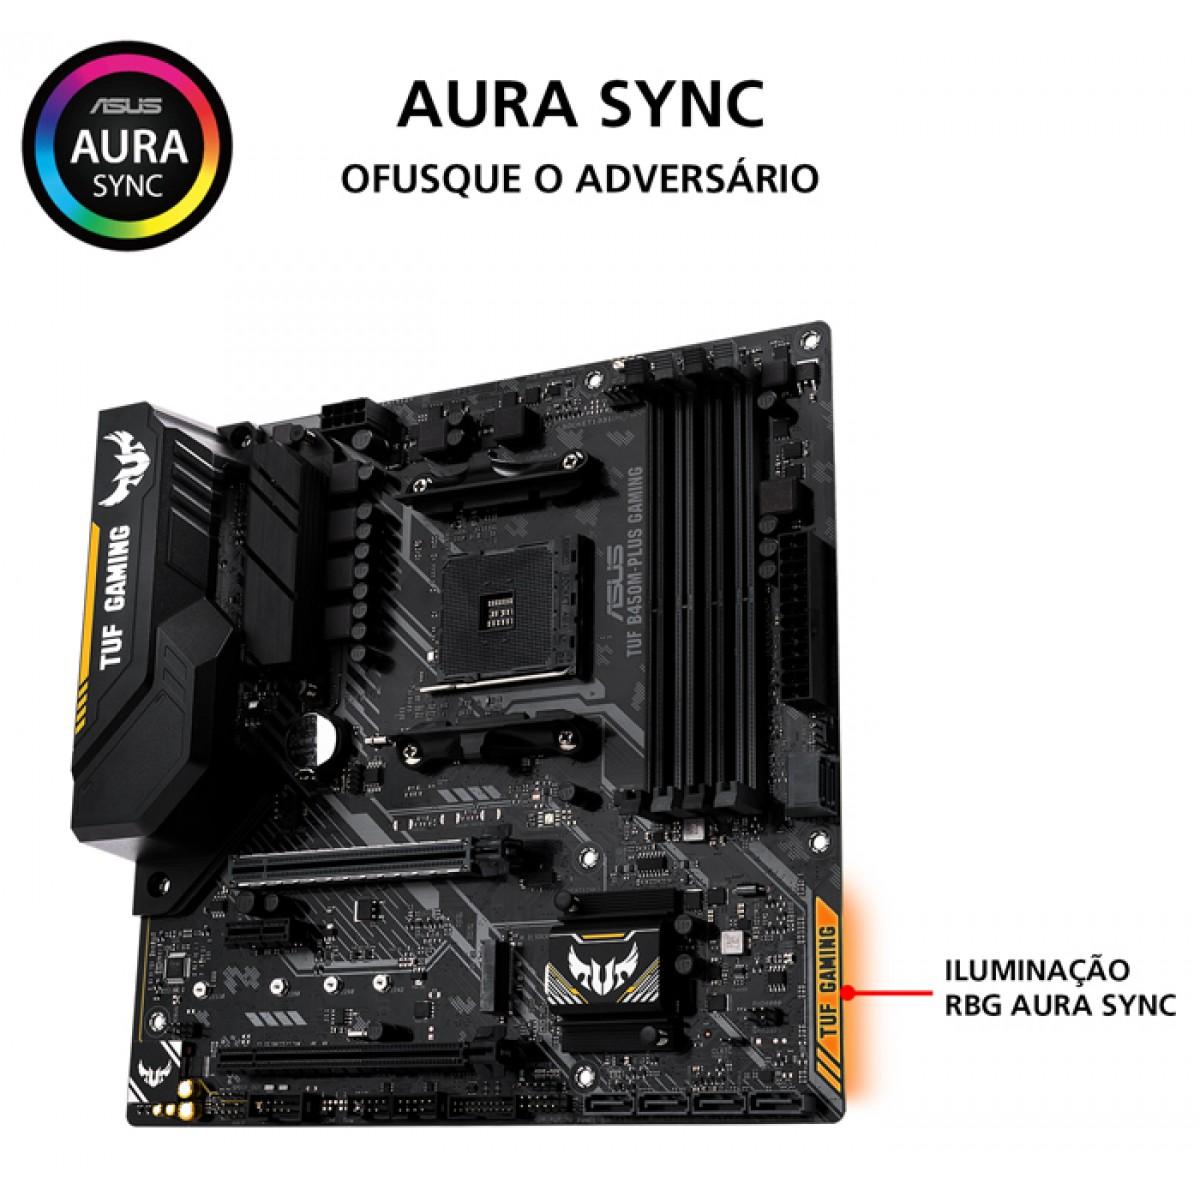 Placa Mãe Asus TUF B450M-PLUS GAMING, Chipset B450, AMD AM4, mATX, DDR4